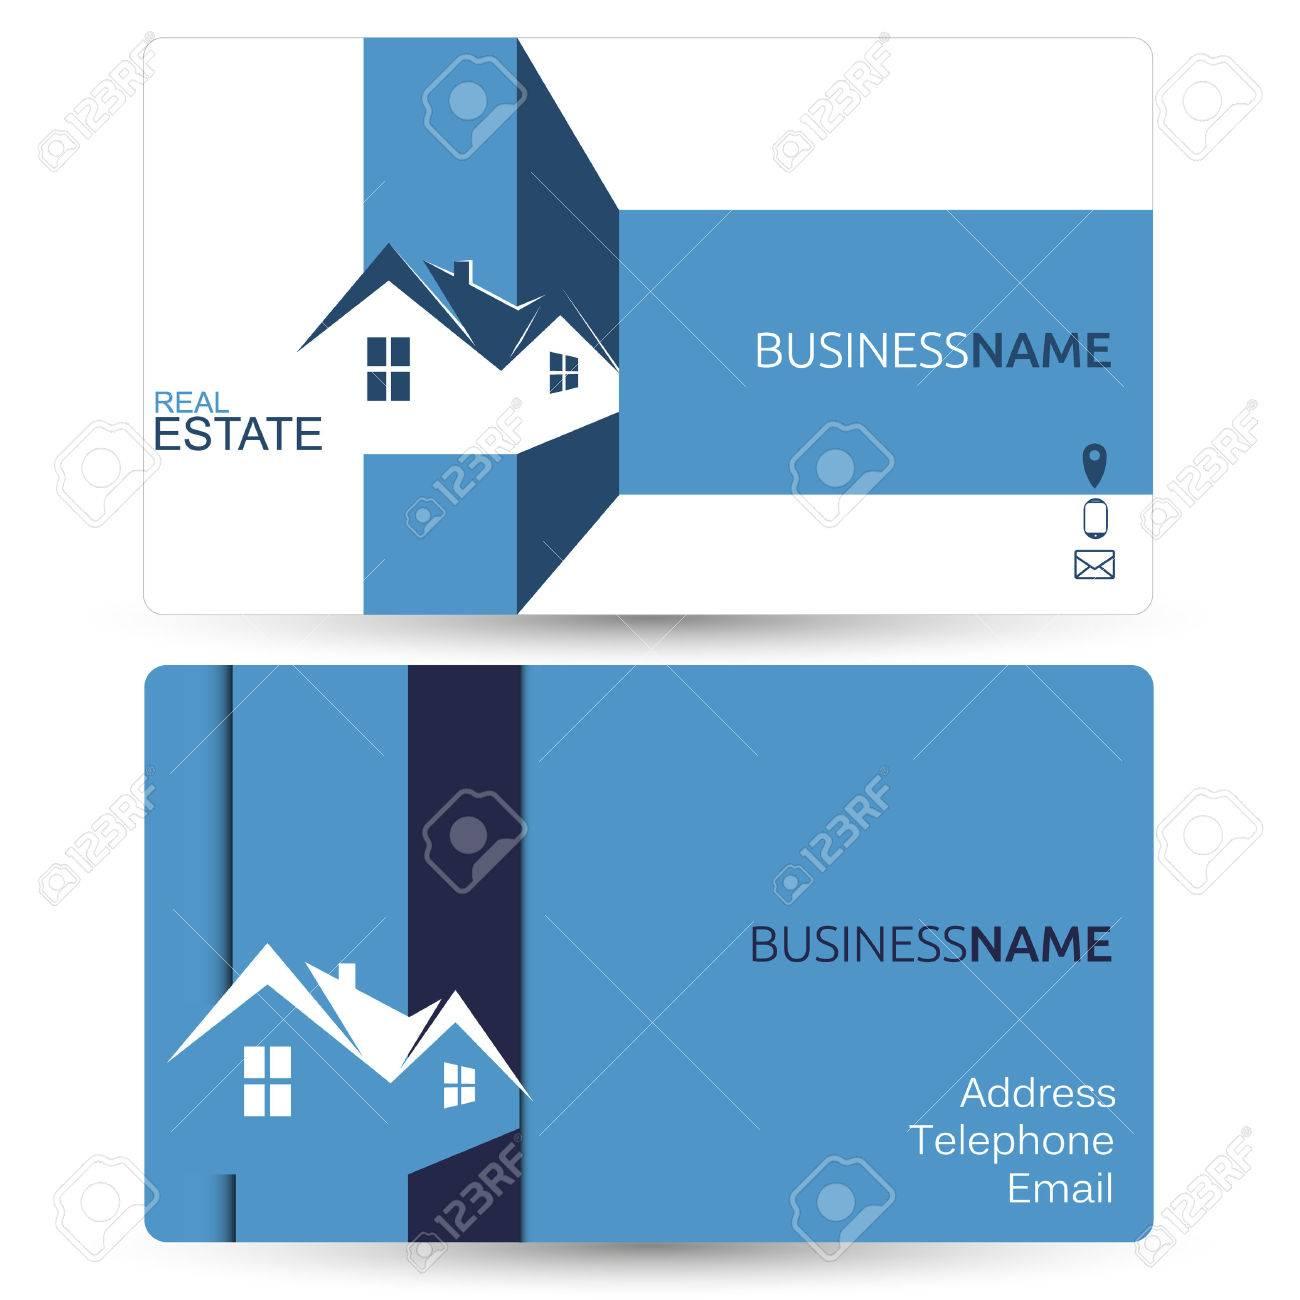 Business card for real estate sales mock vector royalty free business card for real estate sales mock vector stock vector 48804058 reheart Choice Image